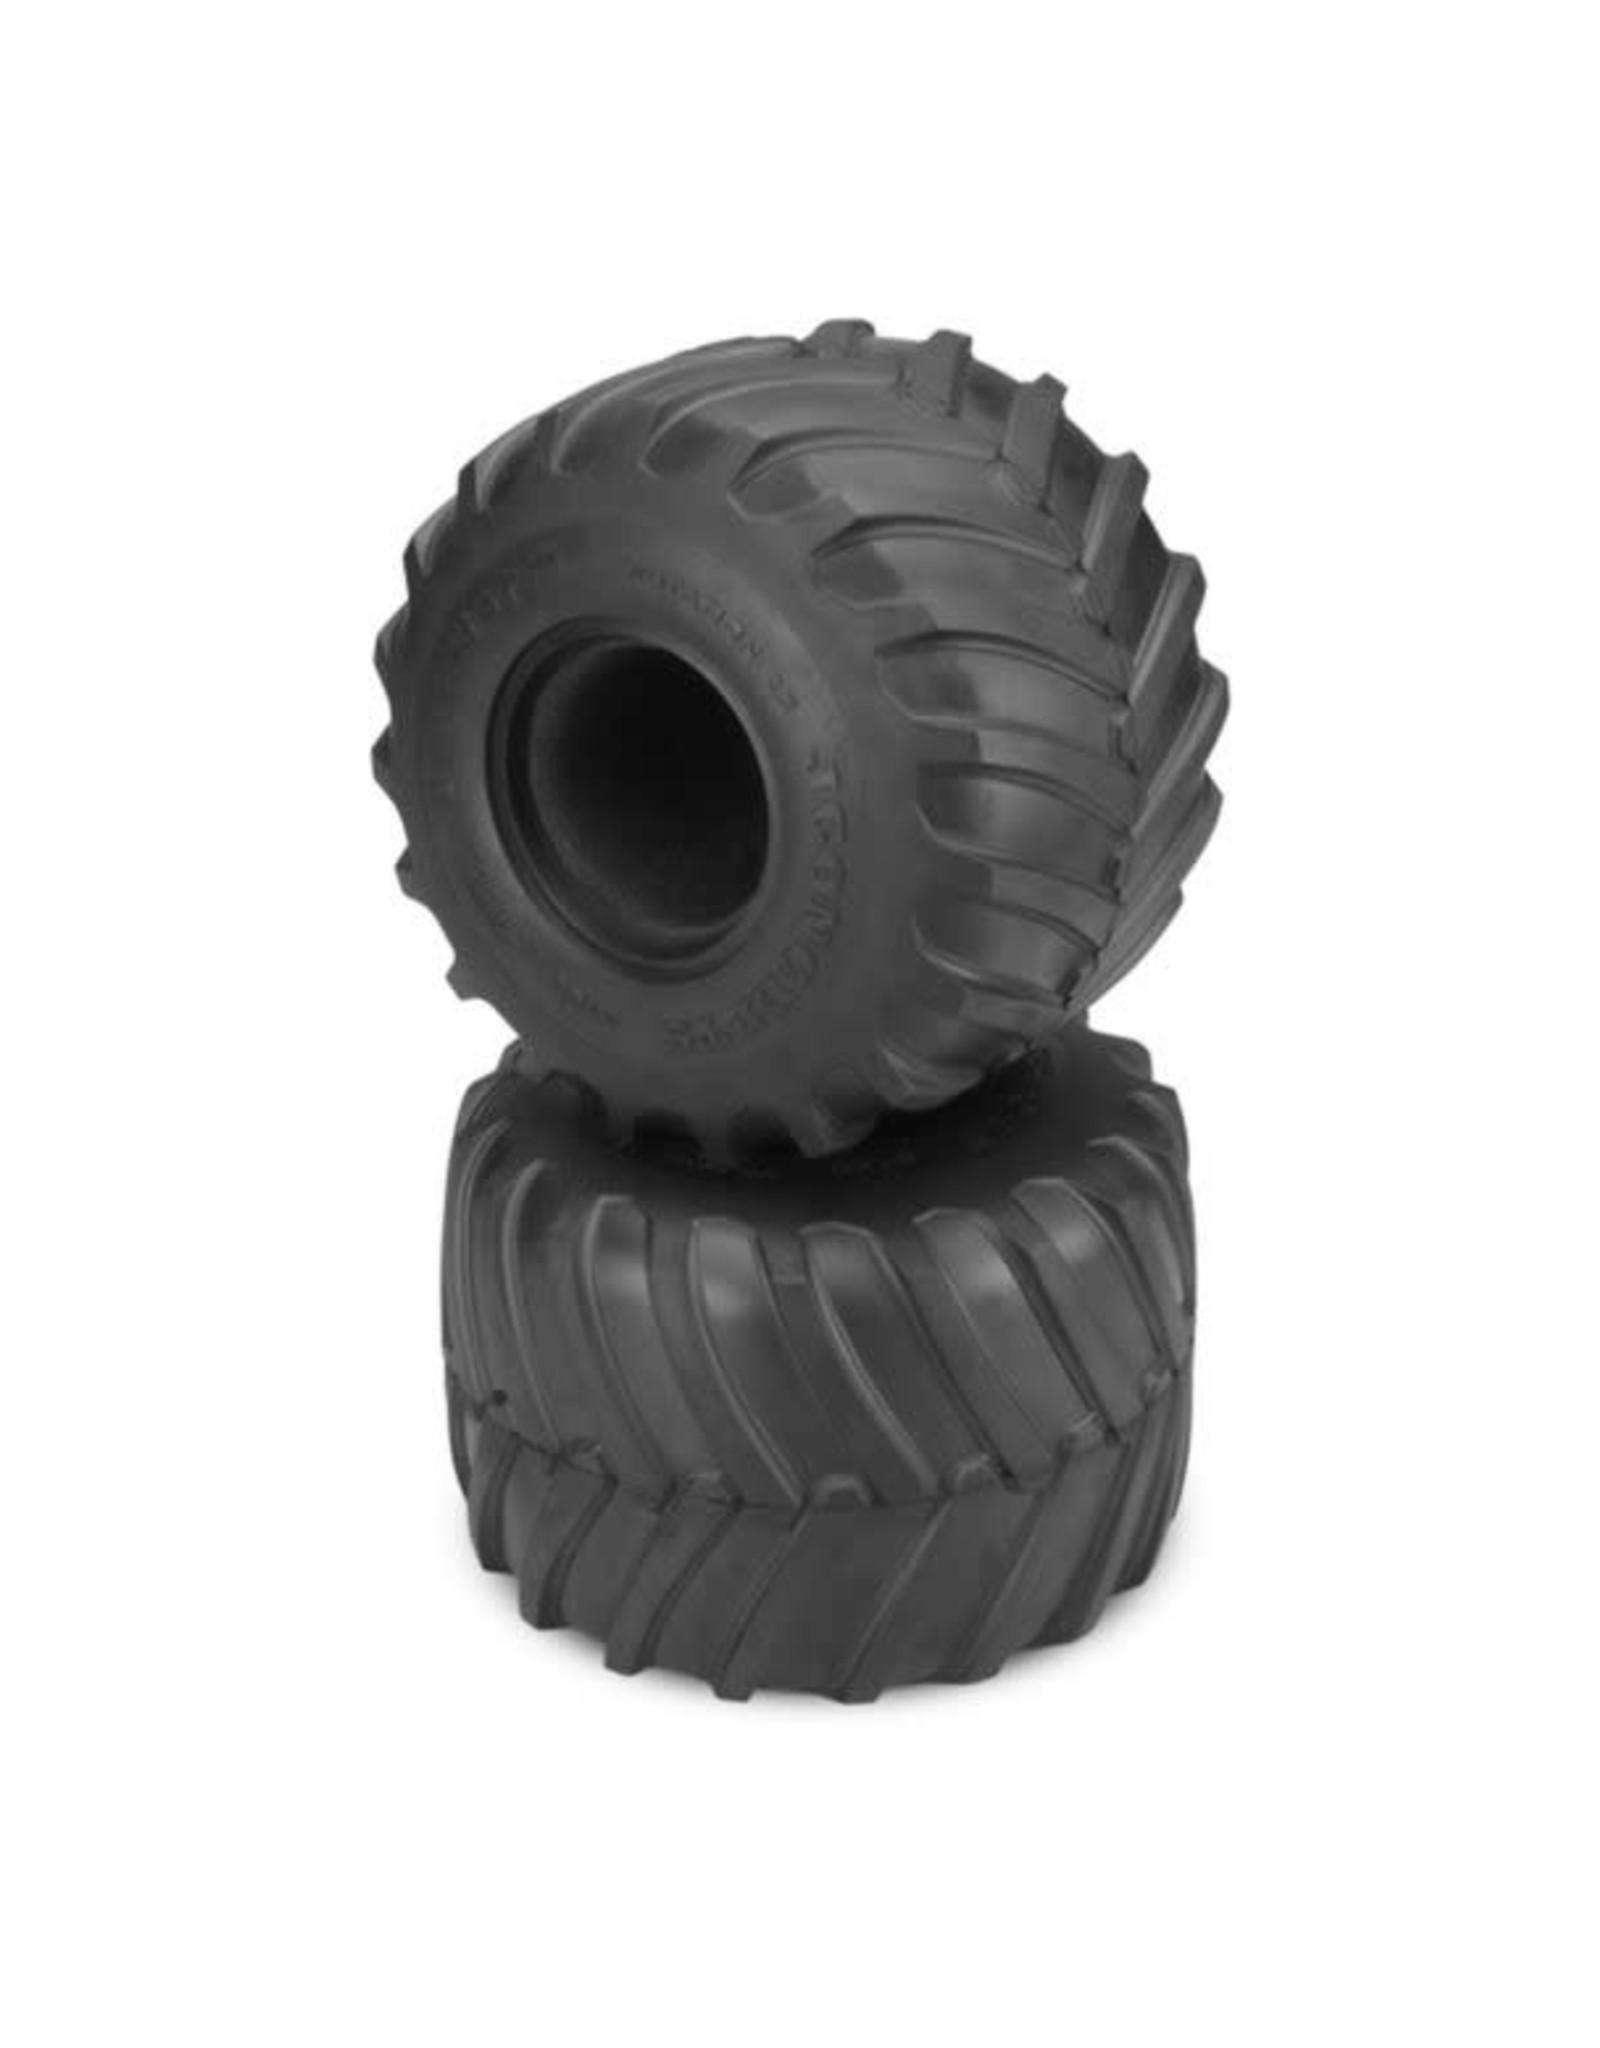 JConcepts Image for Firestorm Monster Truck Tire, Blue Compound